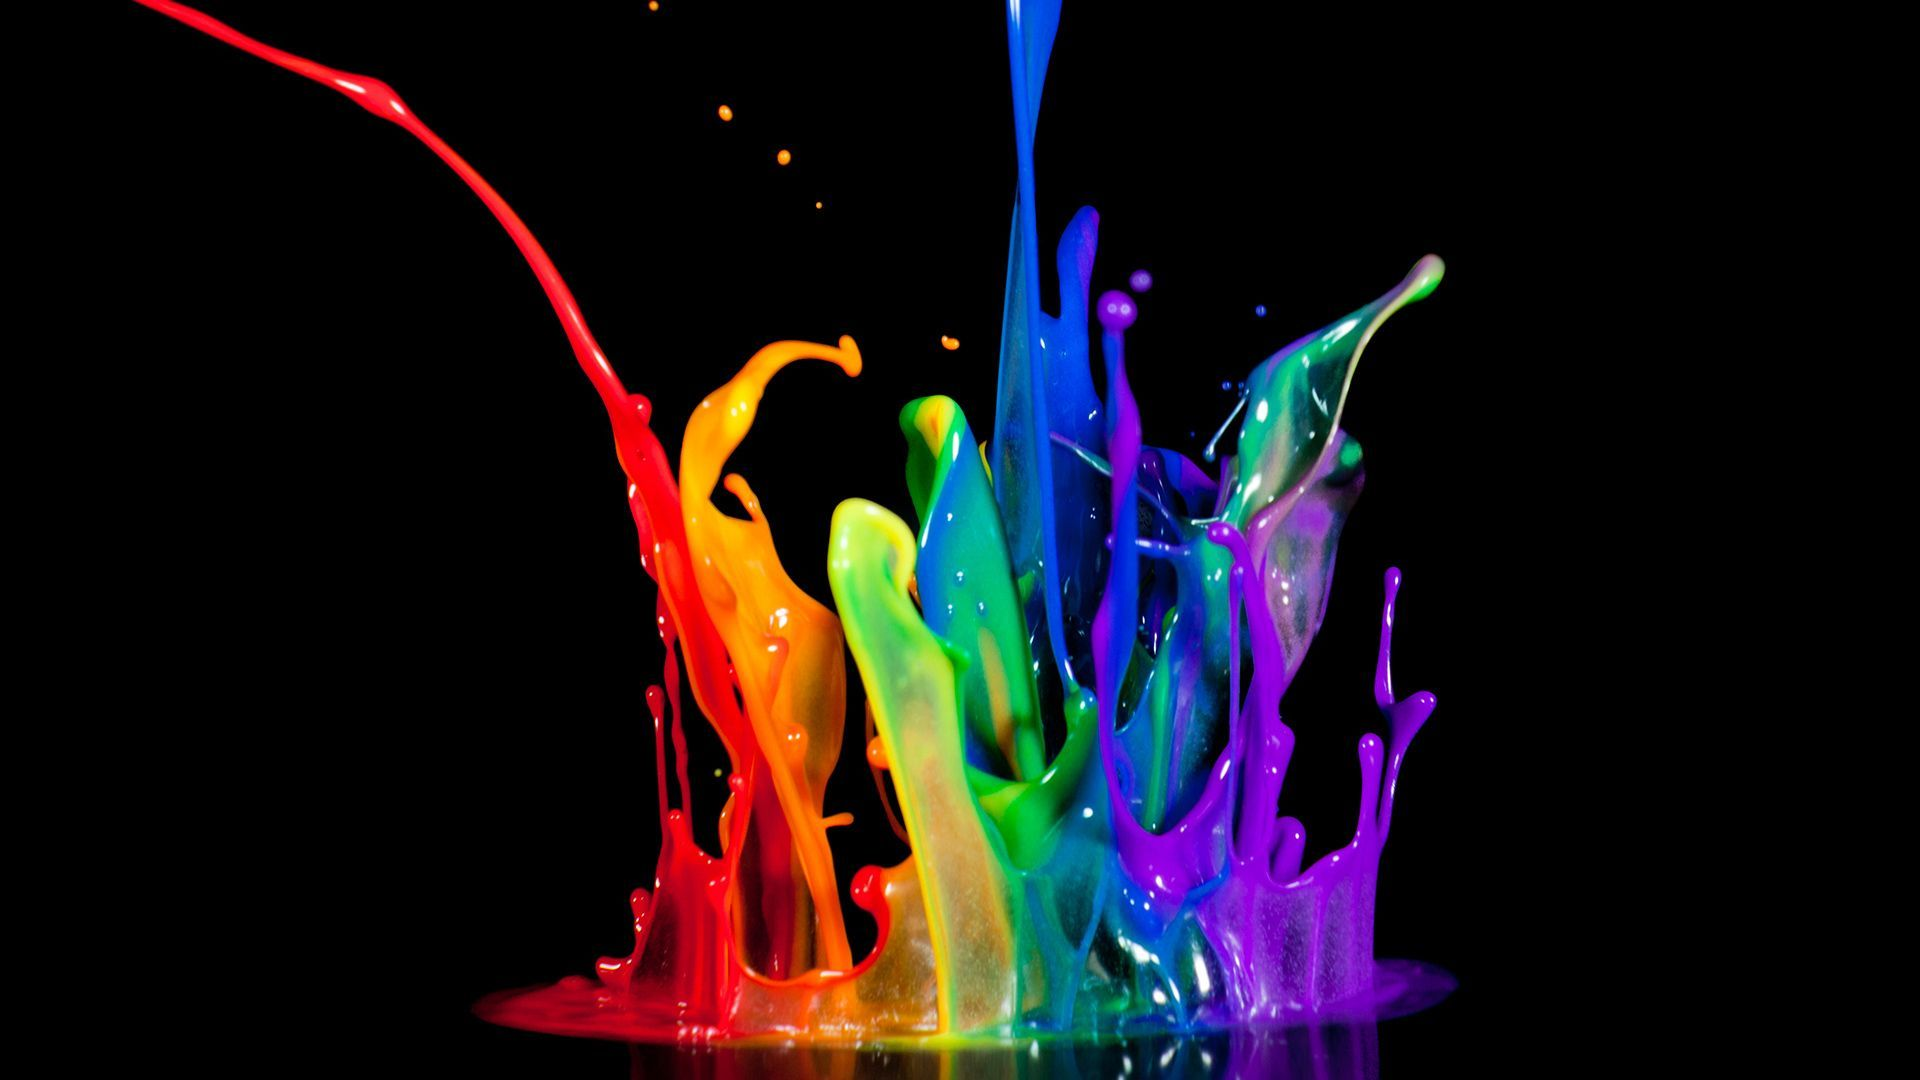 Splash Paint Splash Artistic Hd Wallpapers taken from